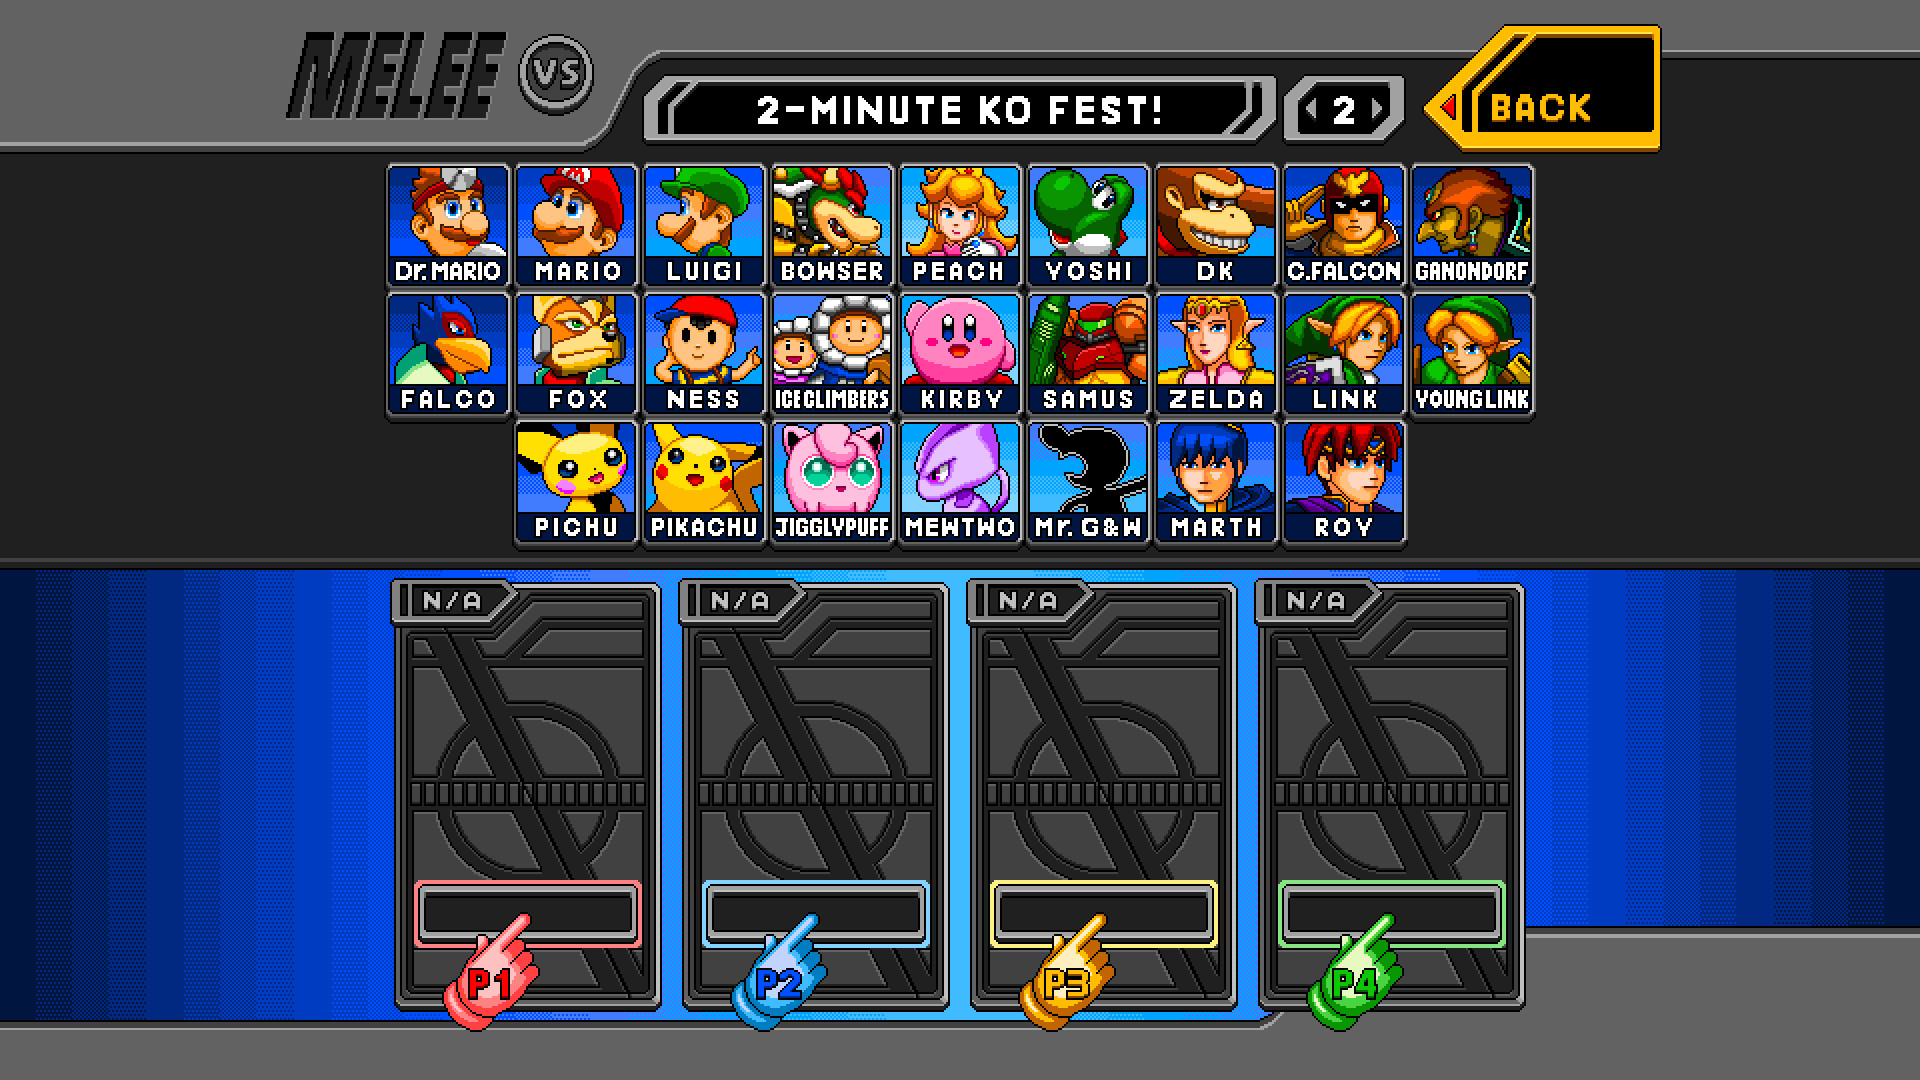 Start of the menu screen